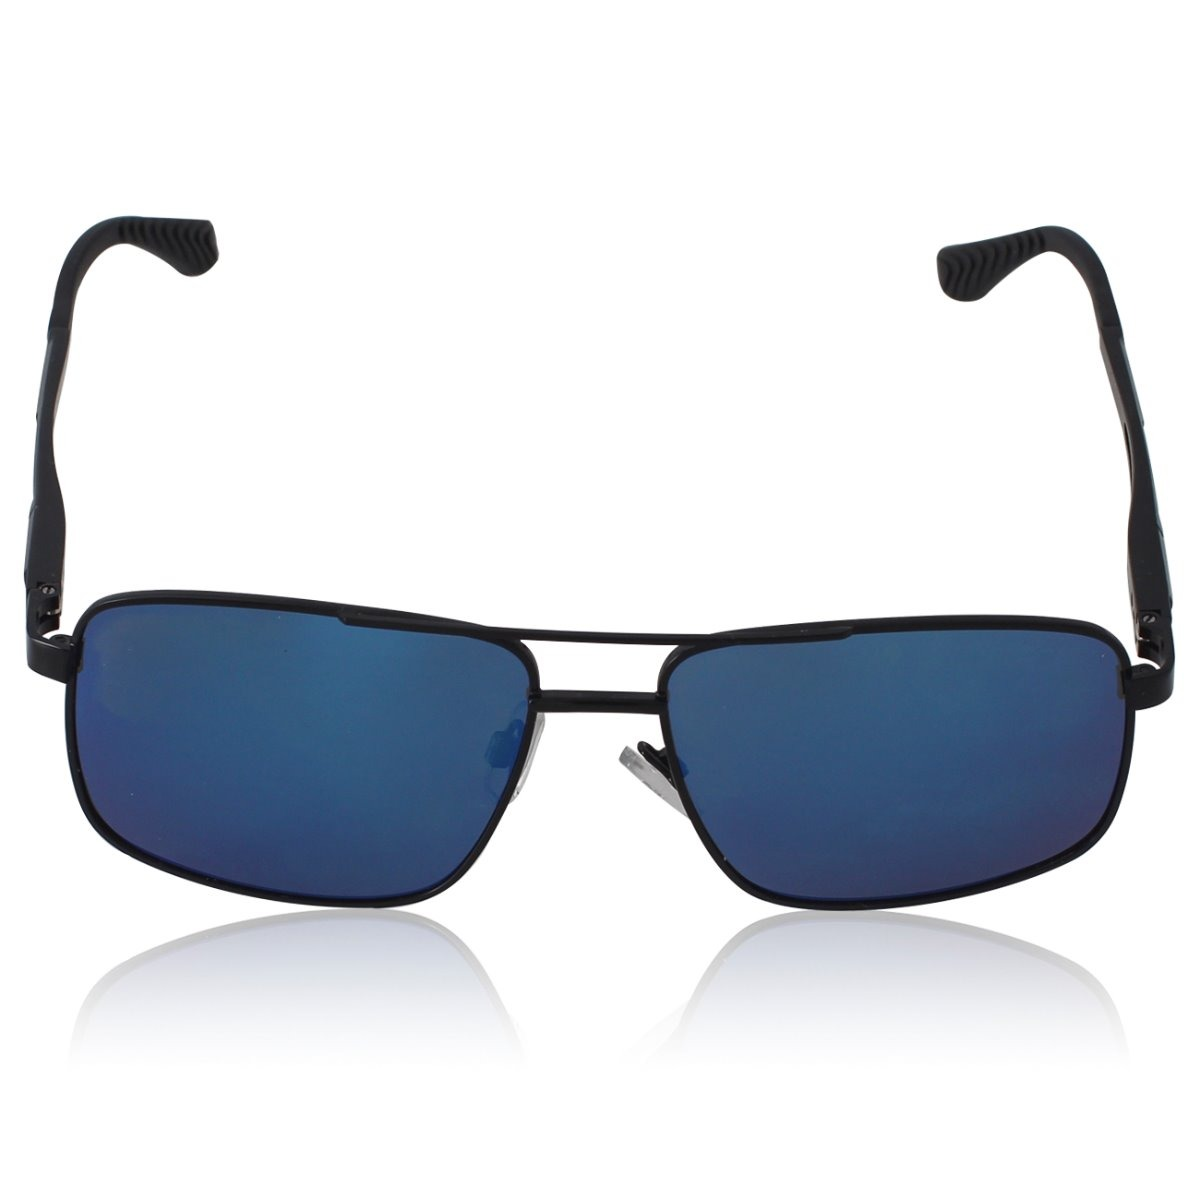 6ef15f4d4 oculos de sol masculino esportivo lente polarizada espelhada. Carregando  zoom.